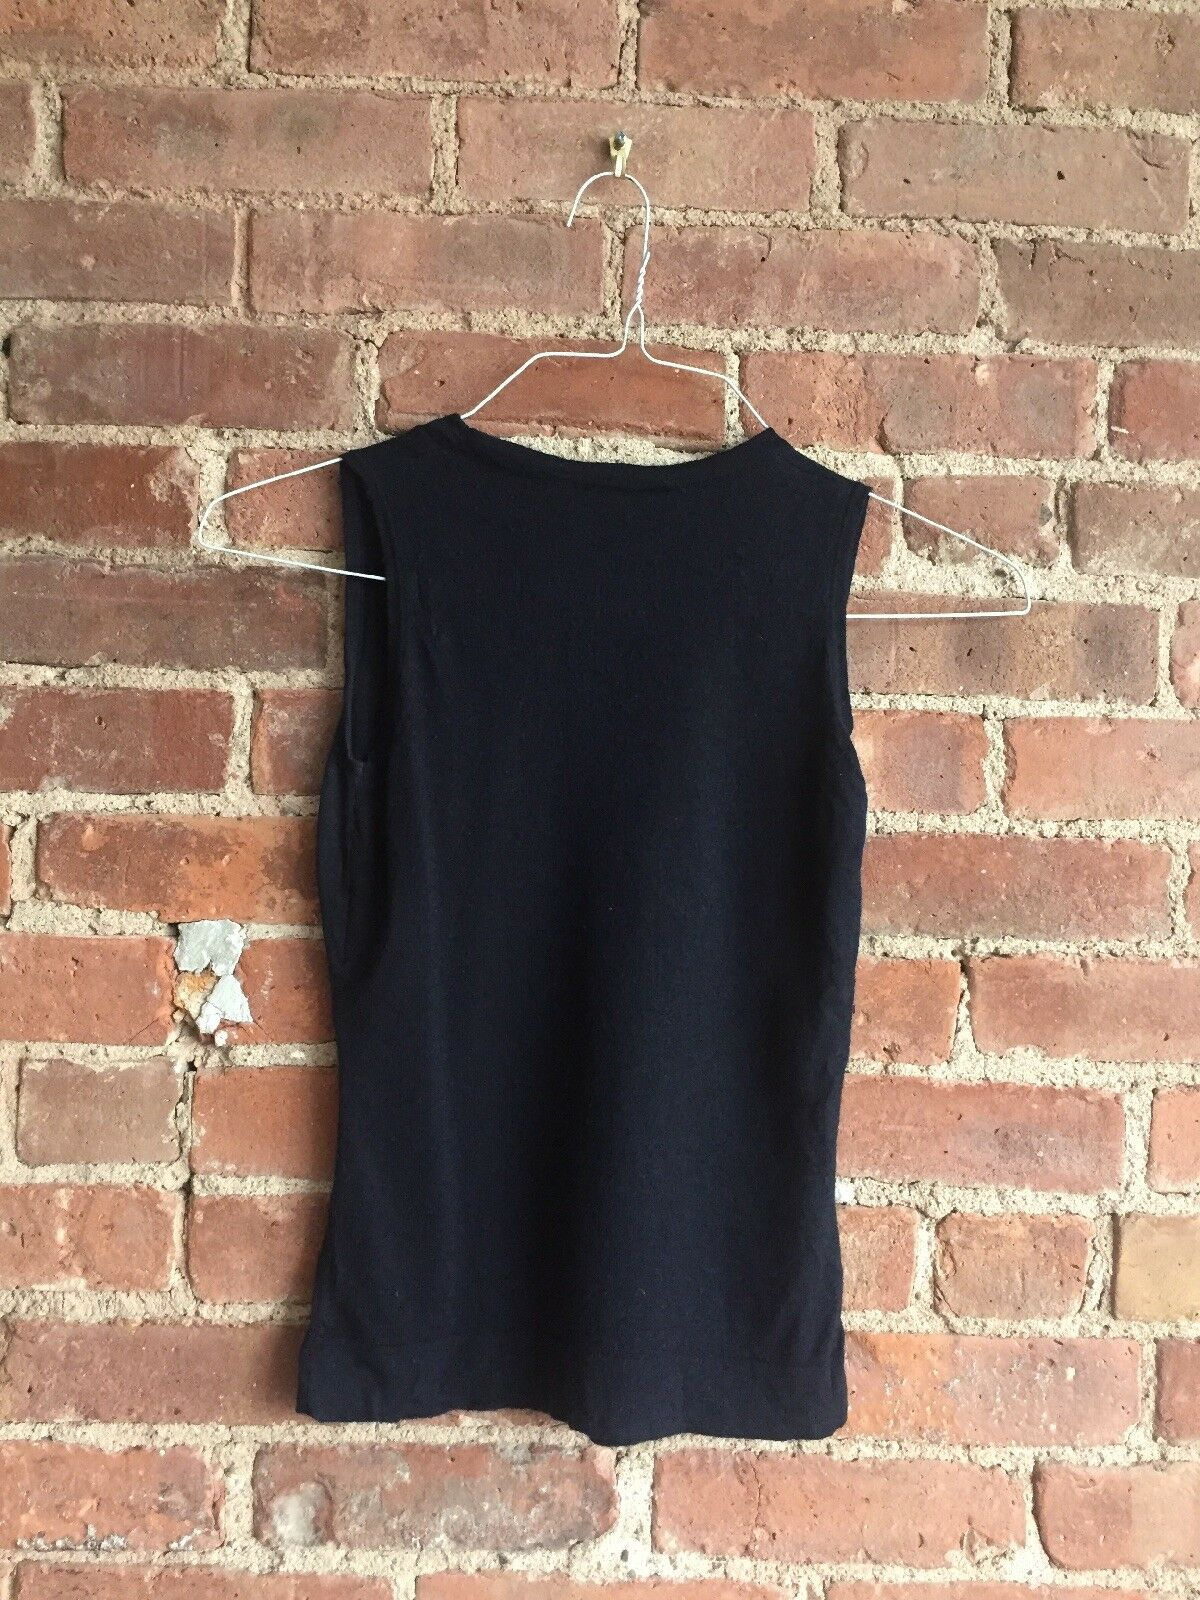 Vintage Christian Dior Boutique Womens Sleeveless Sweater, Sz Sz Sz 36 It, 4 US  e2075d